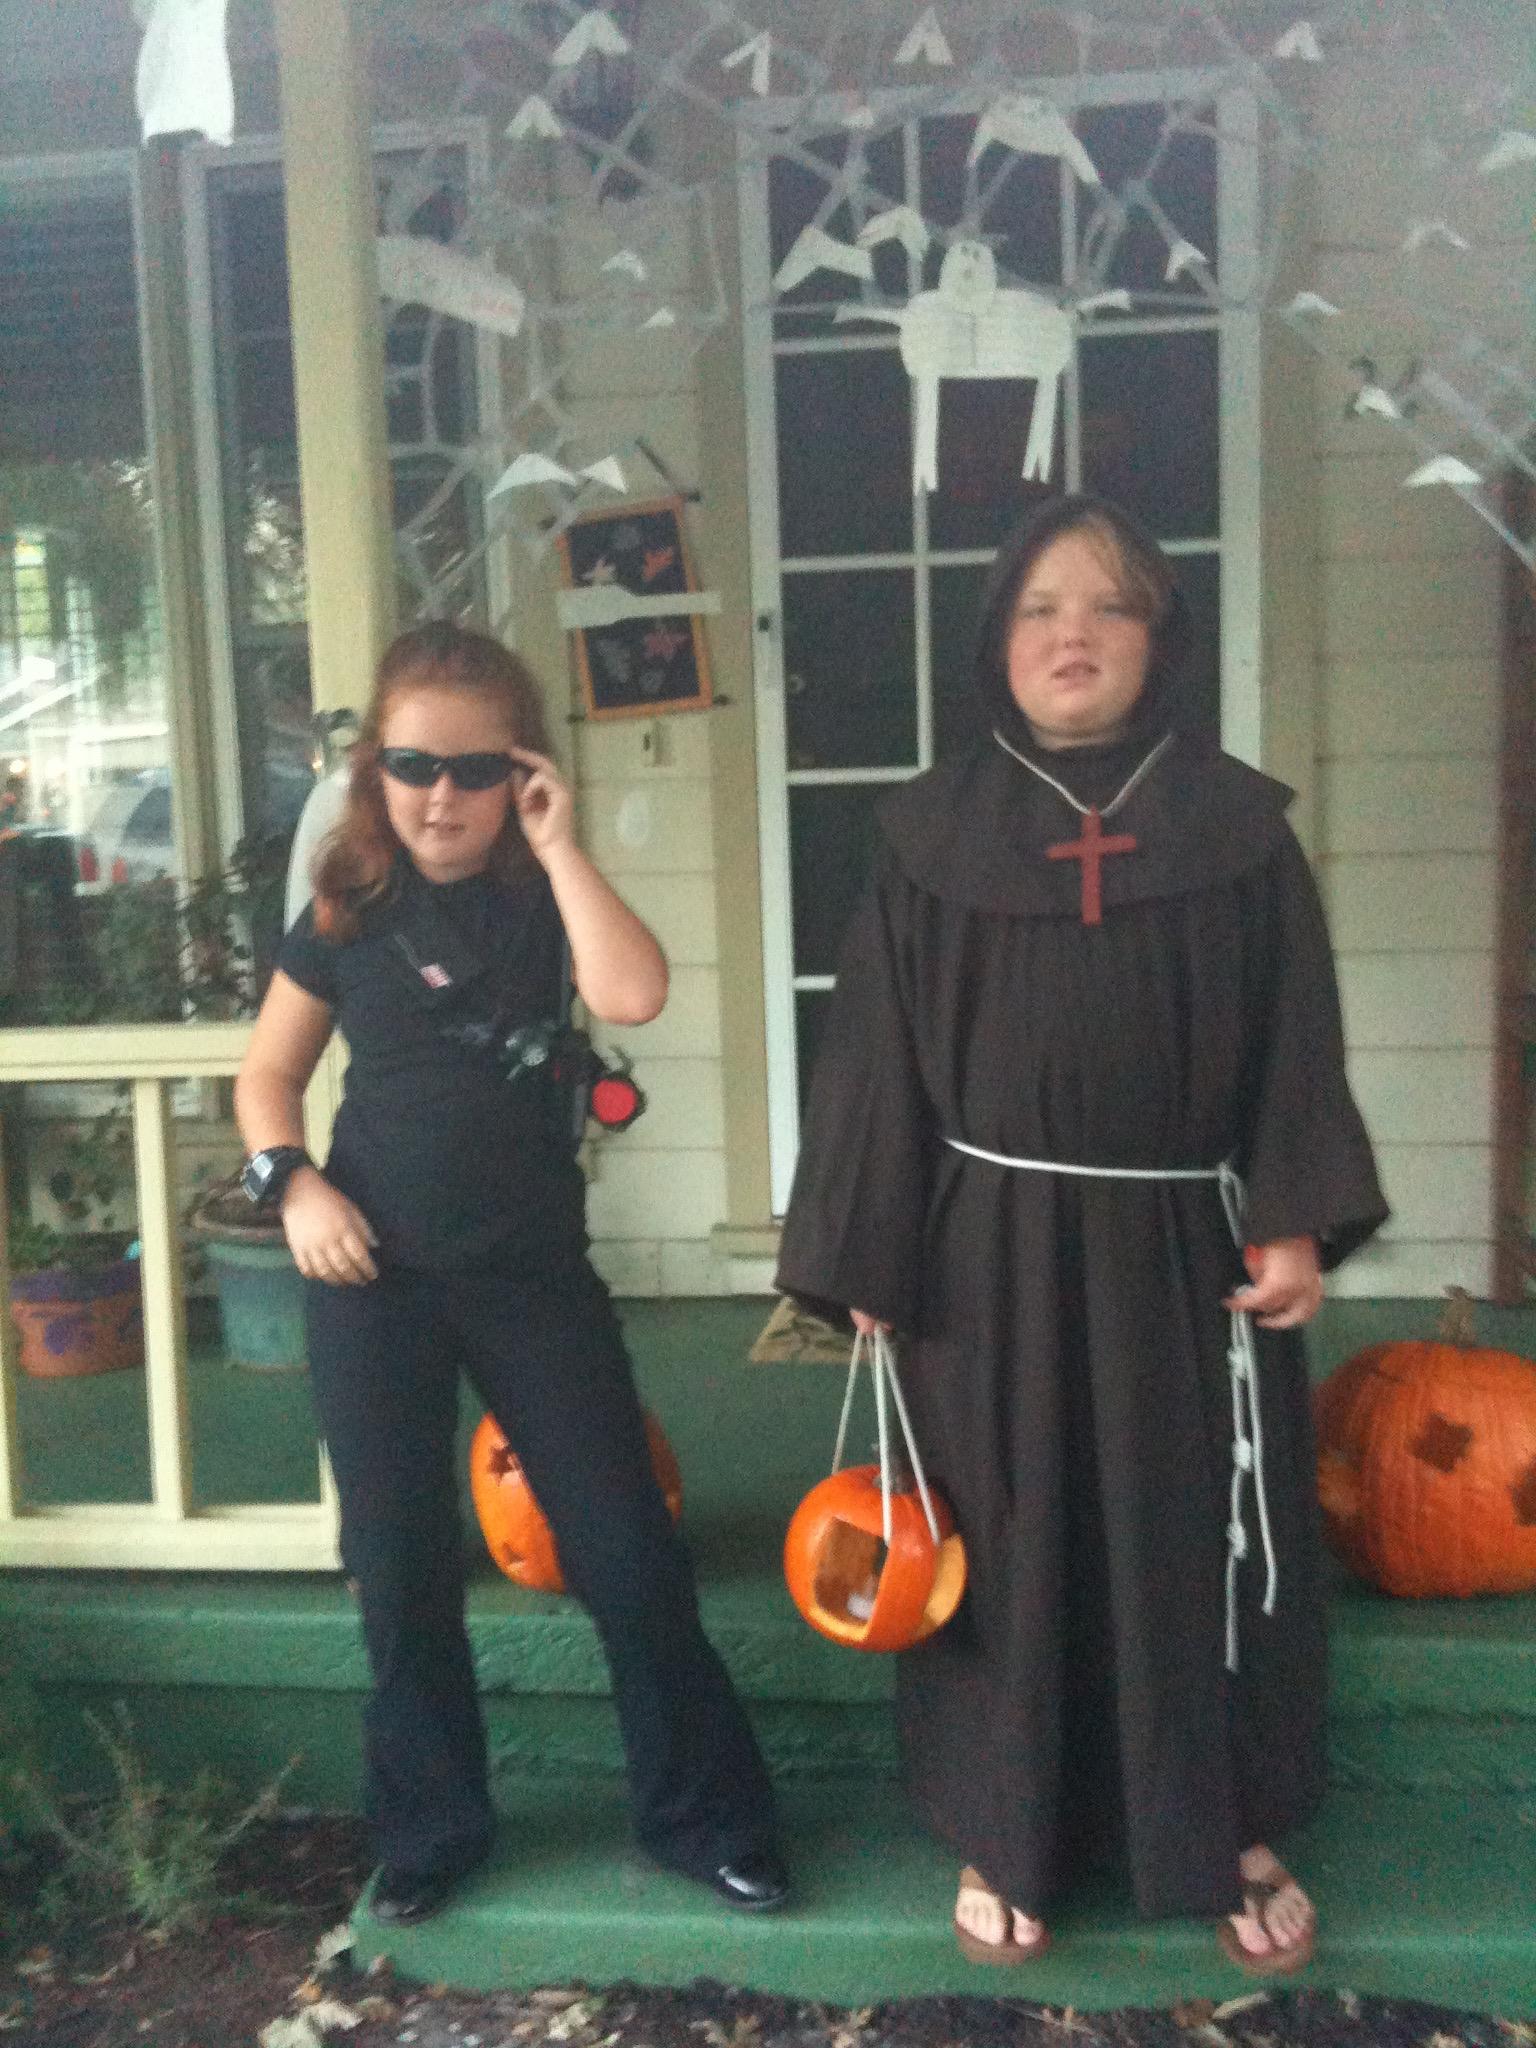 Spy and Friar